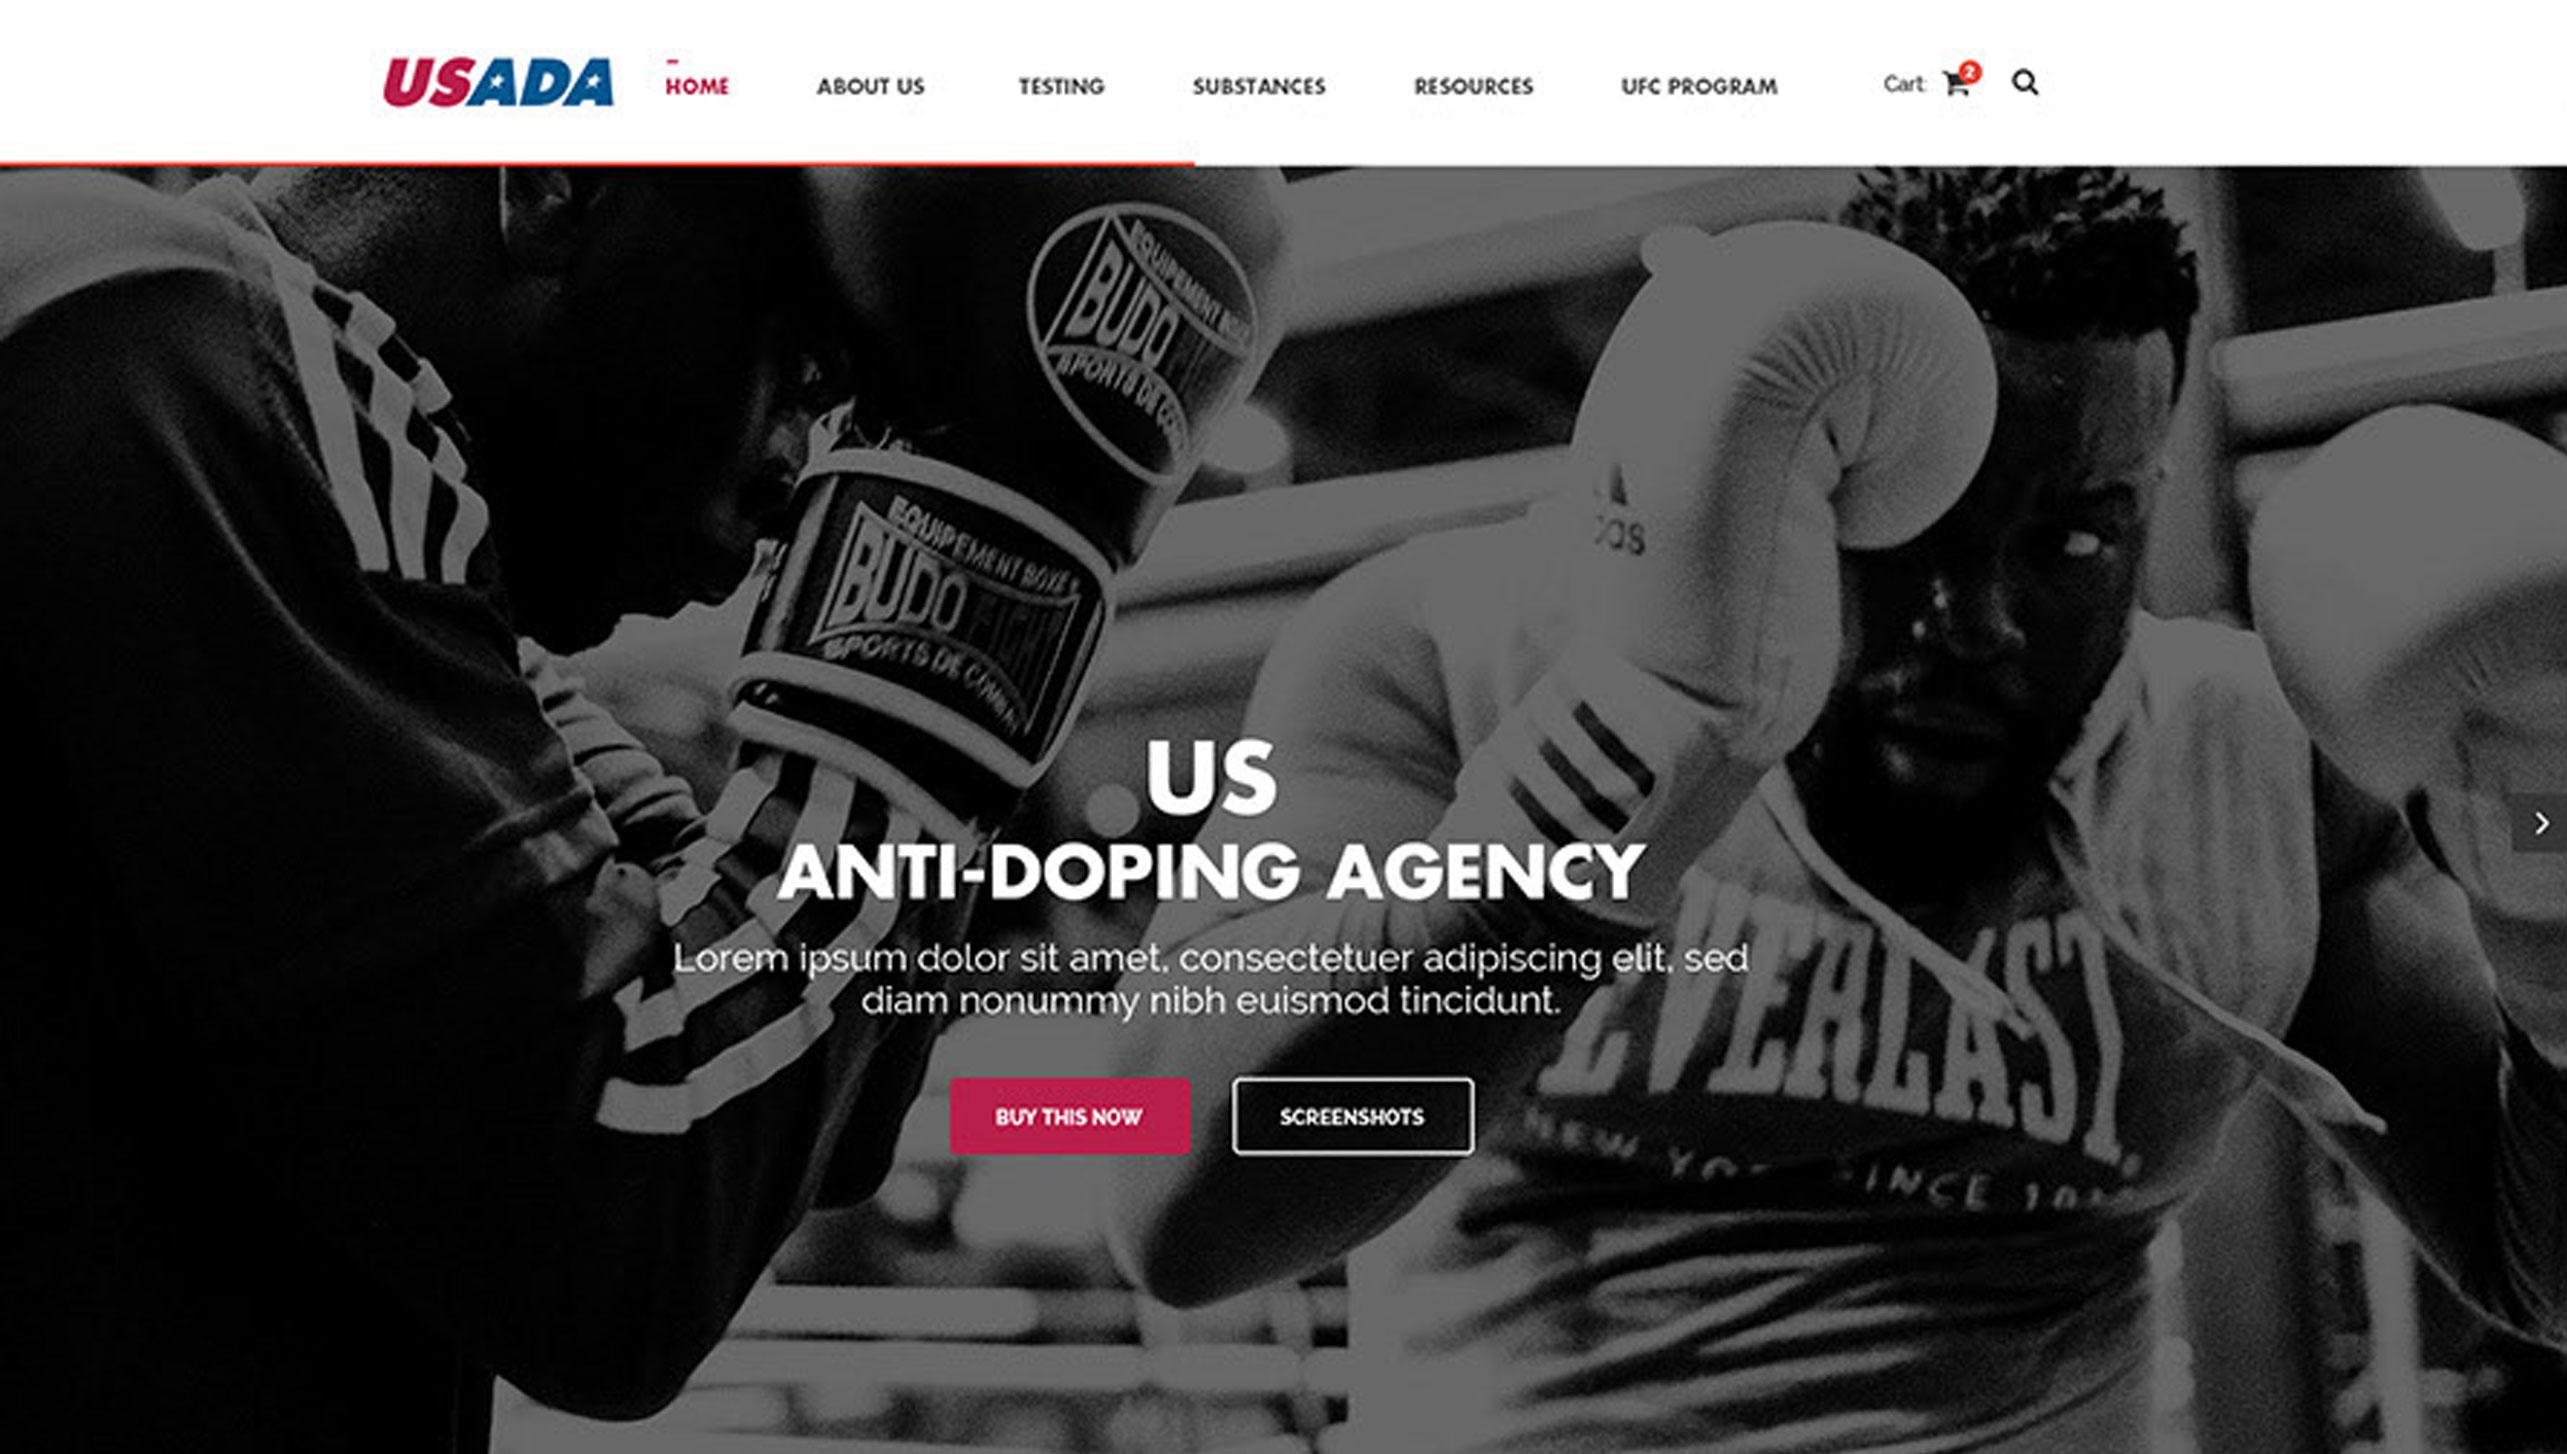 USADA Website Image